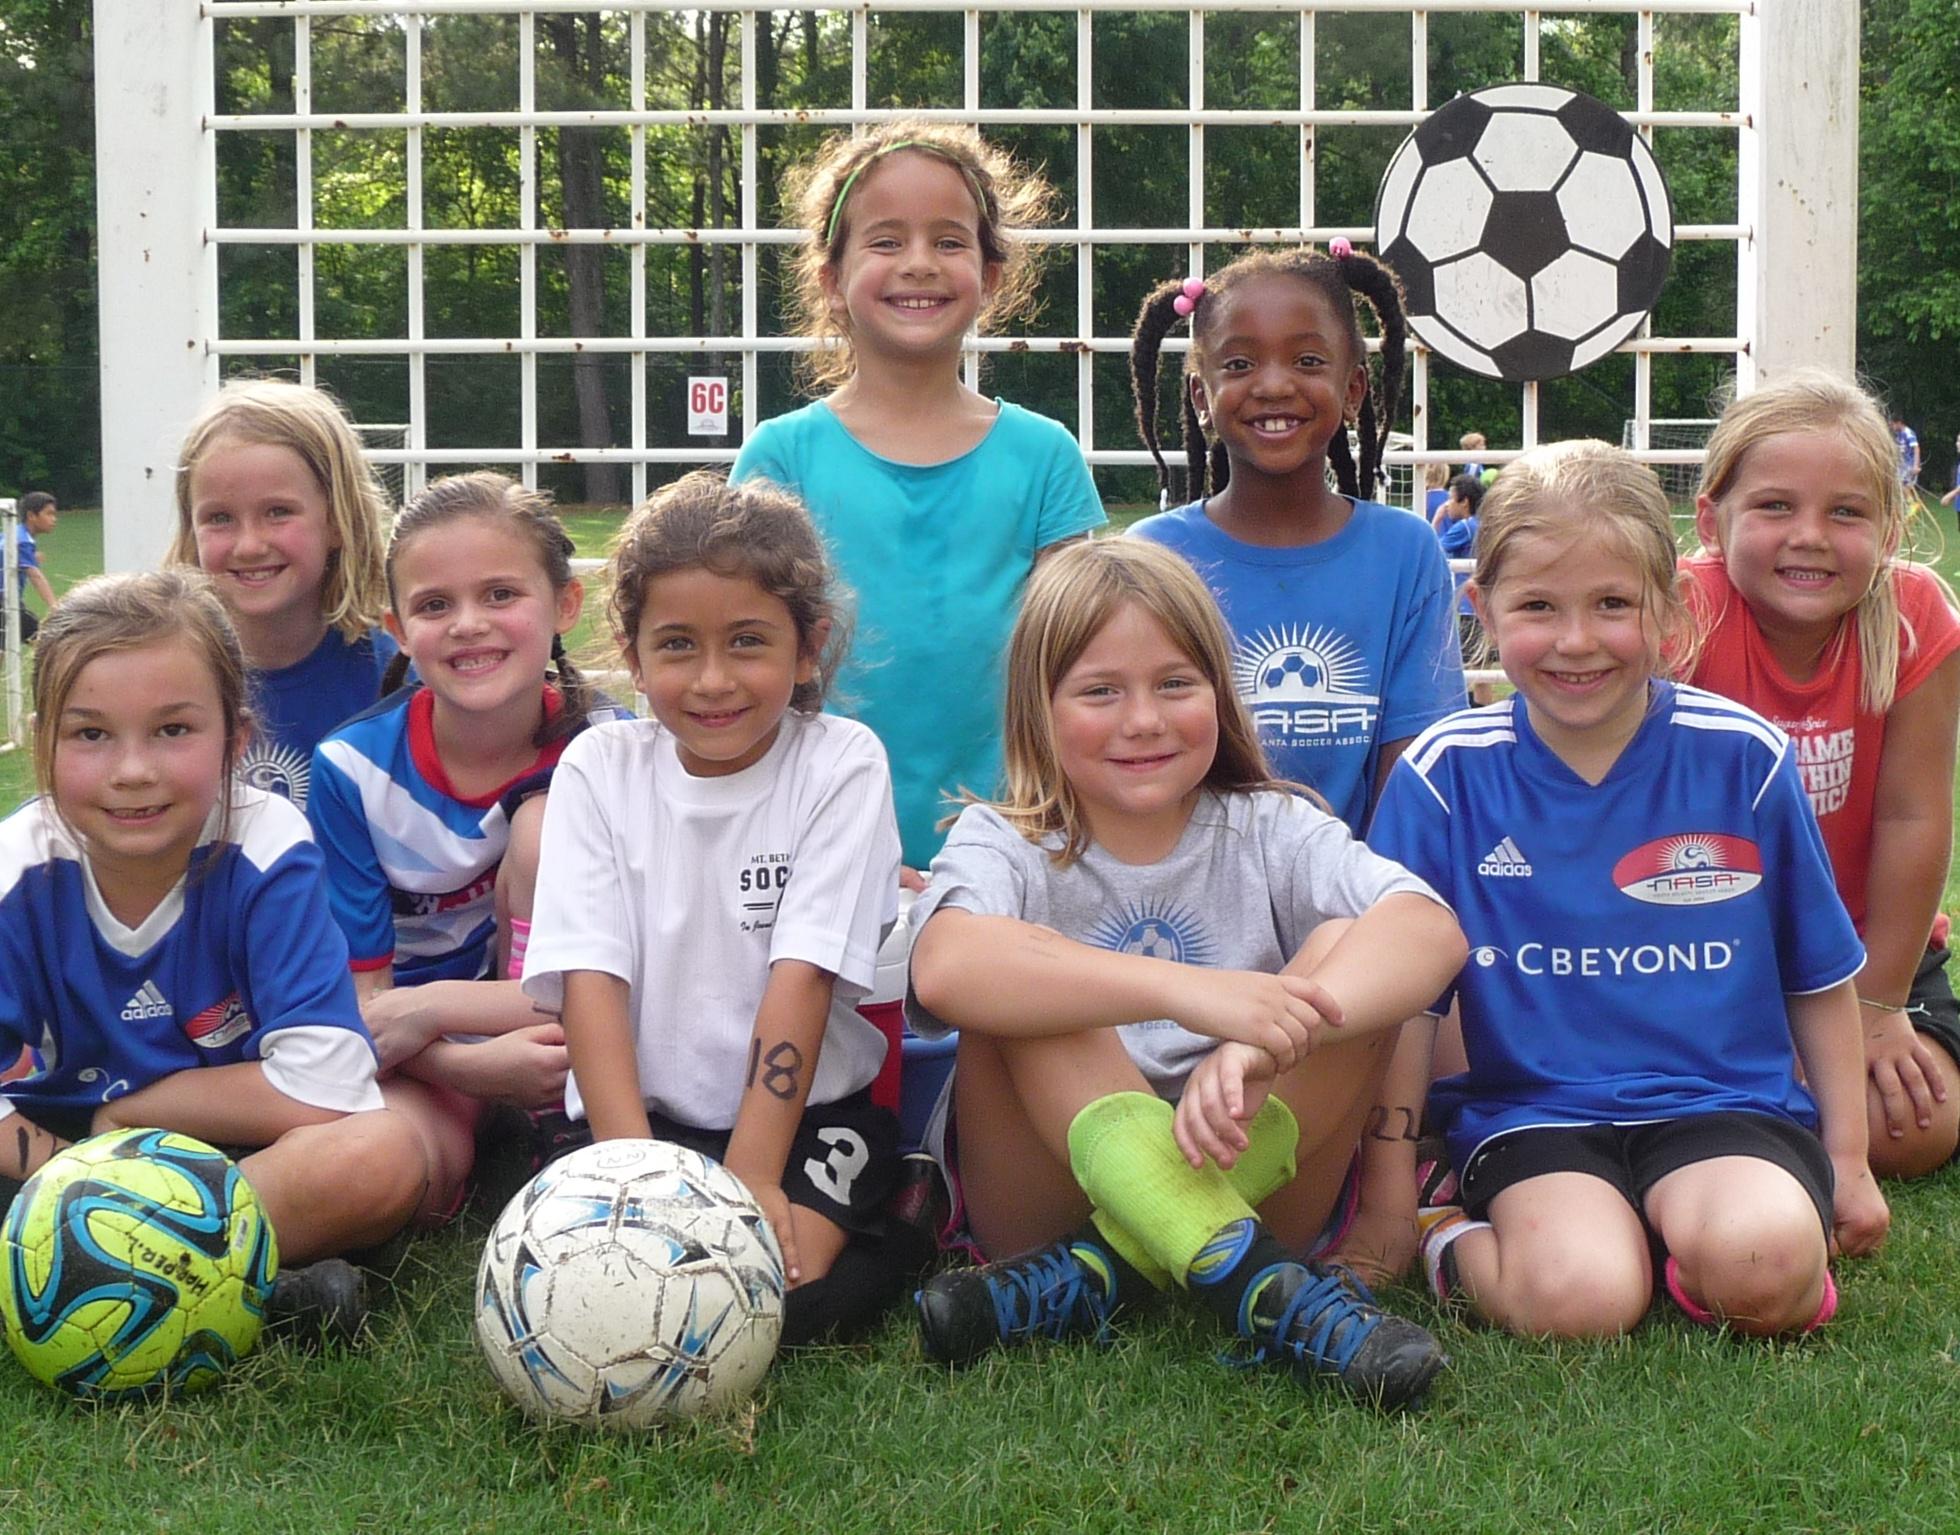 nasa soccer girls - photo #9